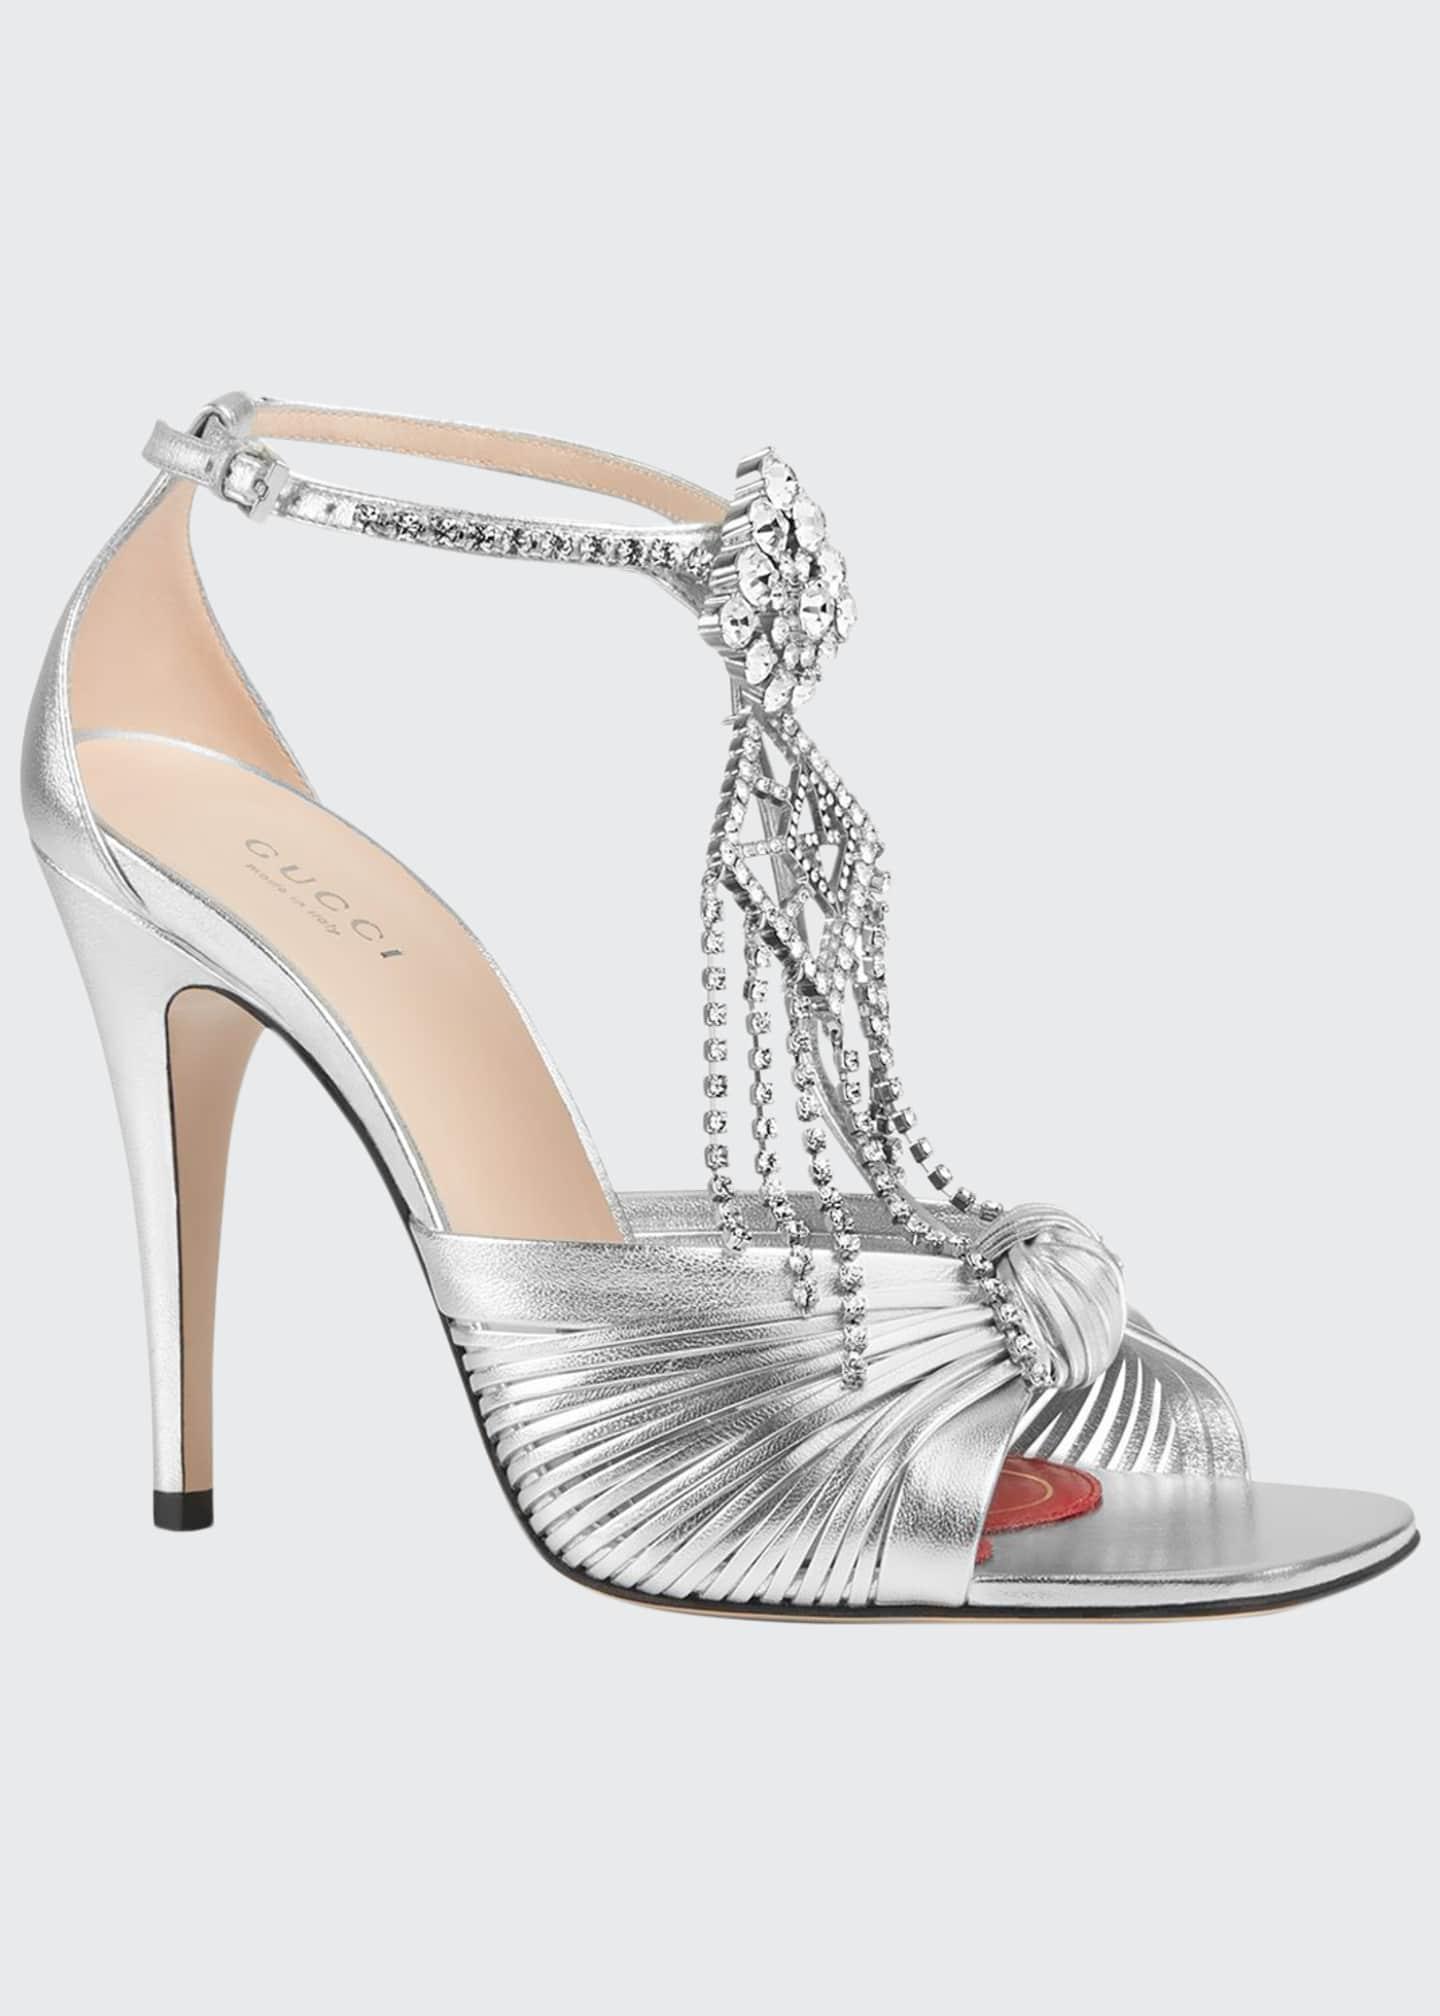 Gucci Crawford Napa Silk Sandals